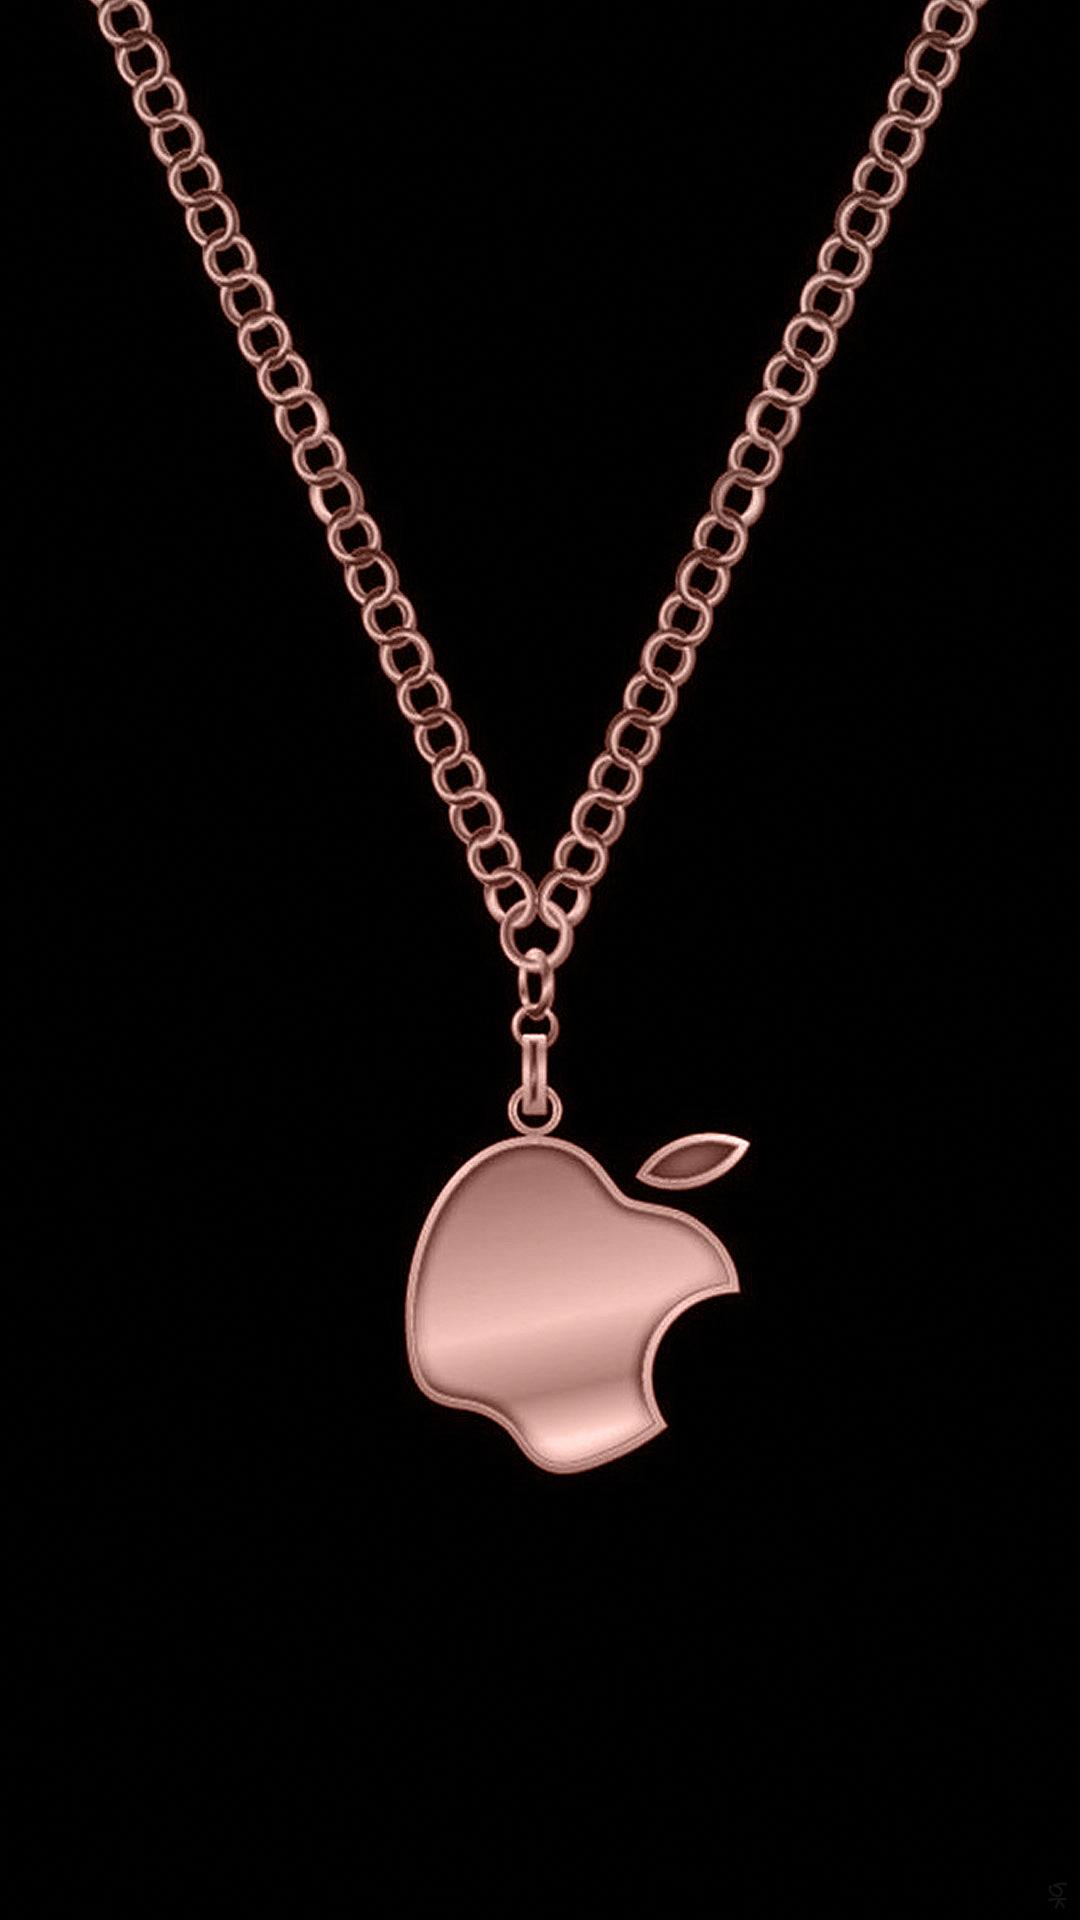 6 Plus Rose Gold Apple Iphonewallpaperrosegold Apple Wallpaper Iphone Gold Iphone Apple Logo Wallpaper